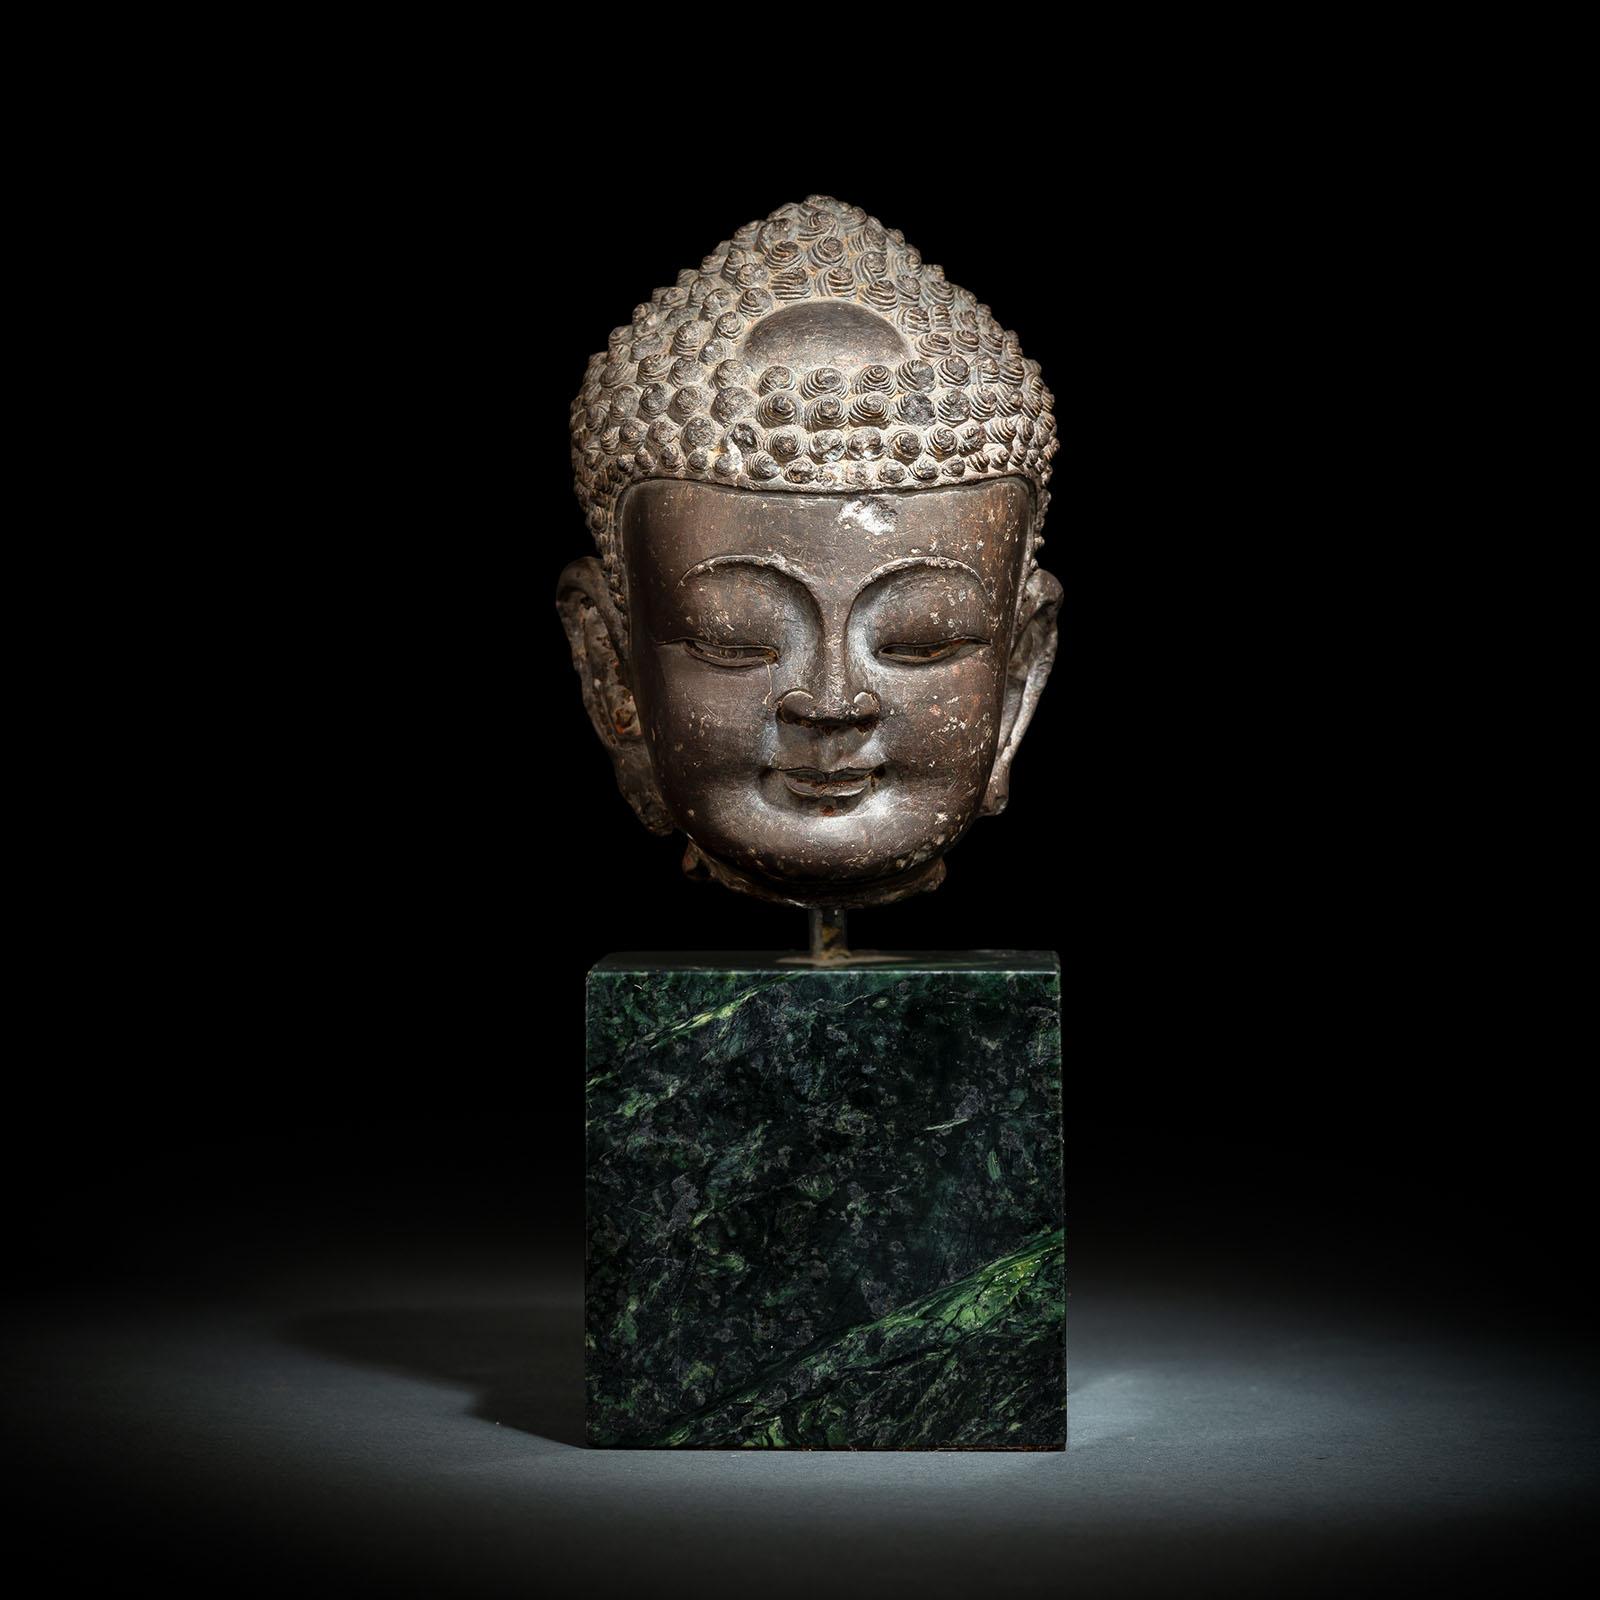 A FINE CARVED GREY-BROWN CARVED STONE HEAD OF BUDDHA SHAKYAMUNI